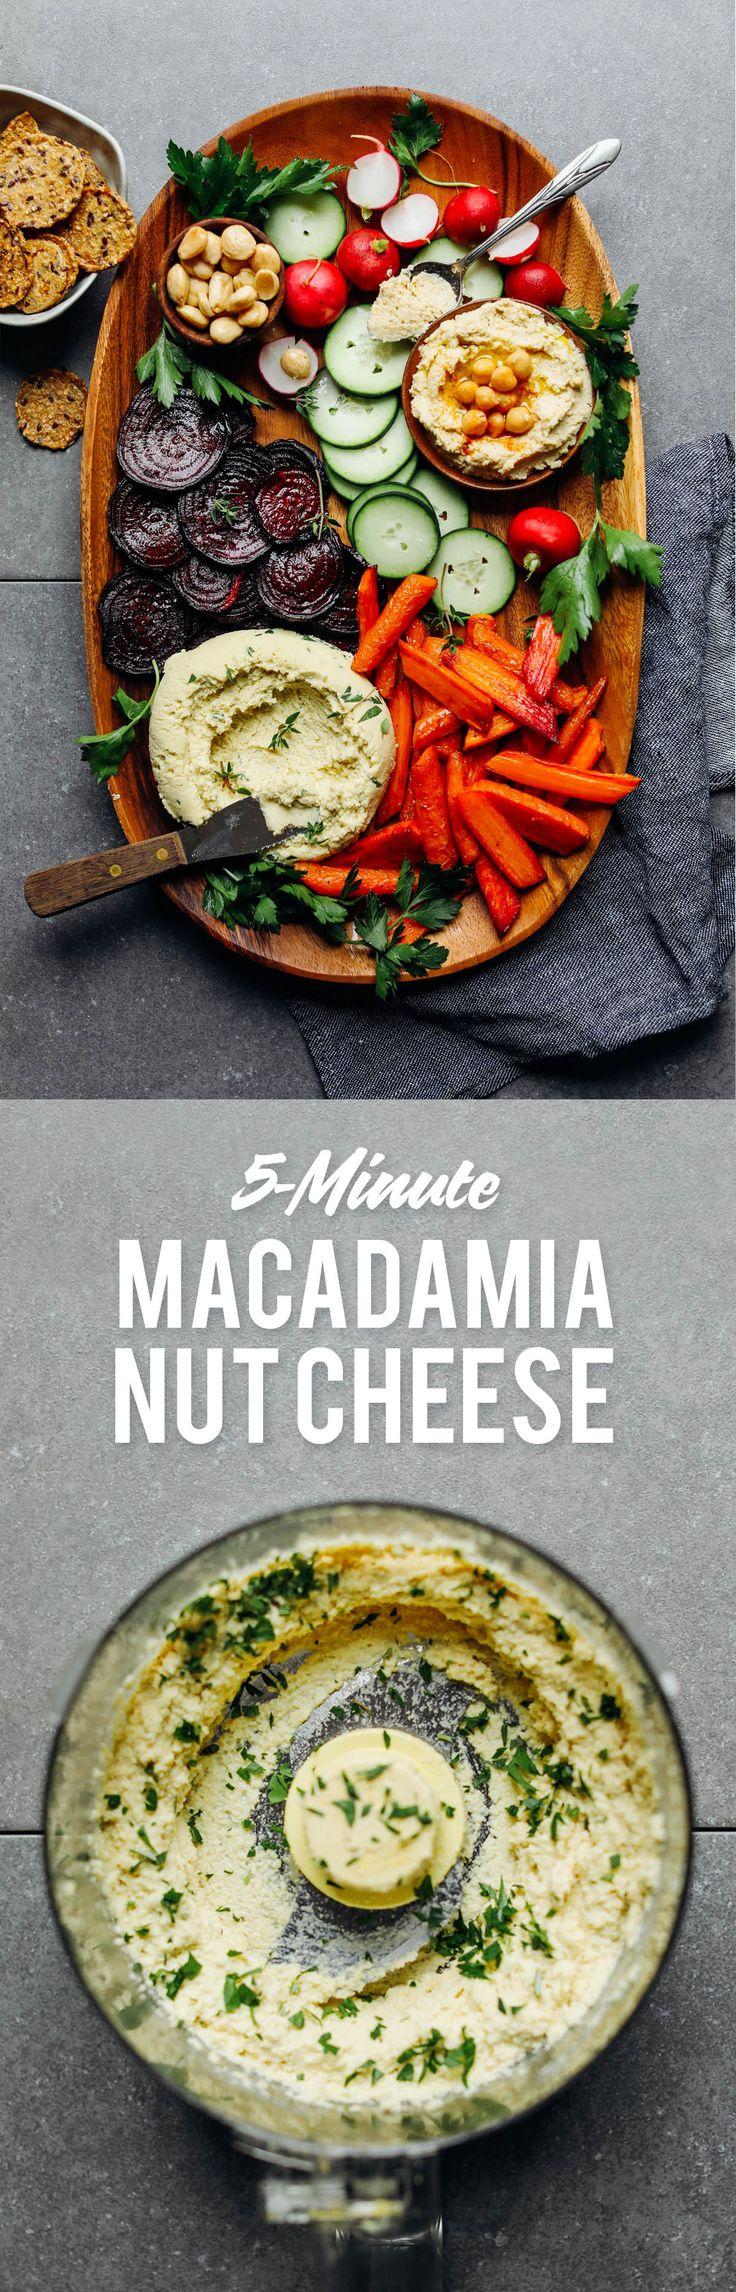 Easy VEGAN Crudite with Macadamia Nut Cheese  #minimalistbaker